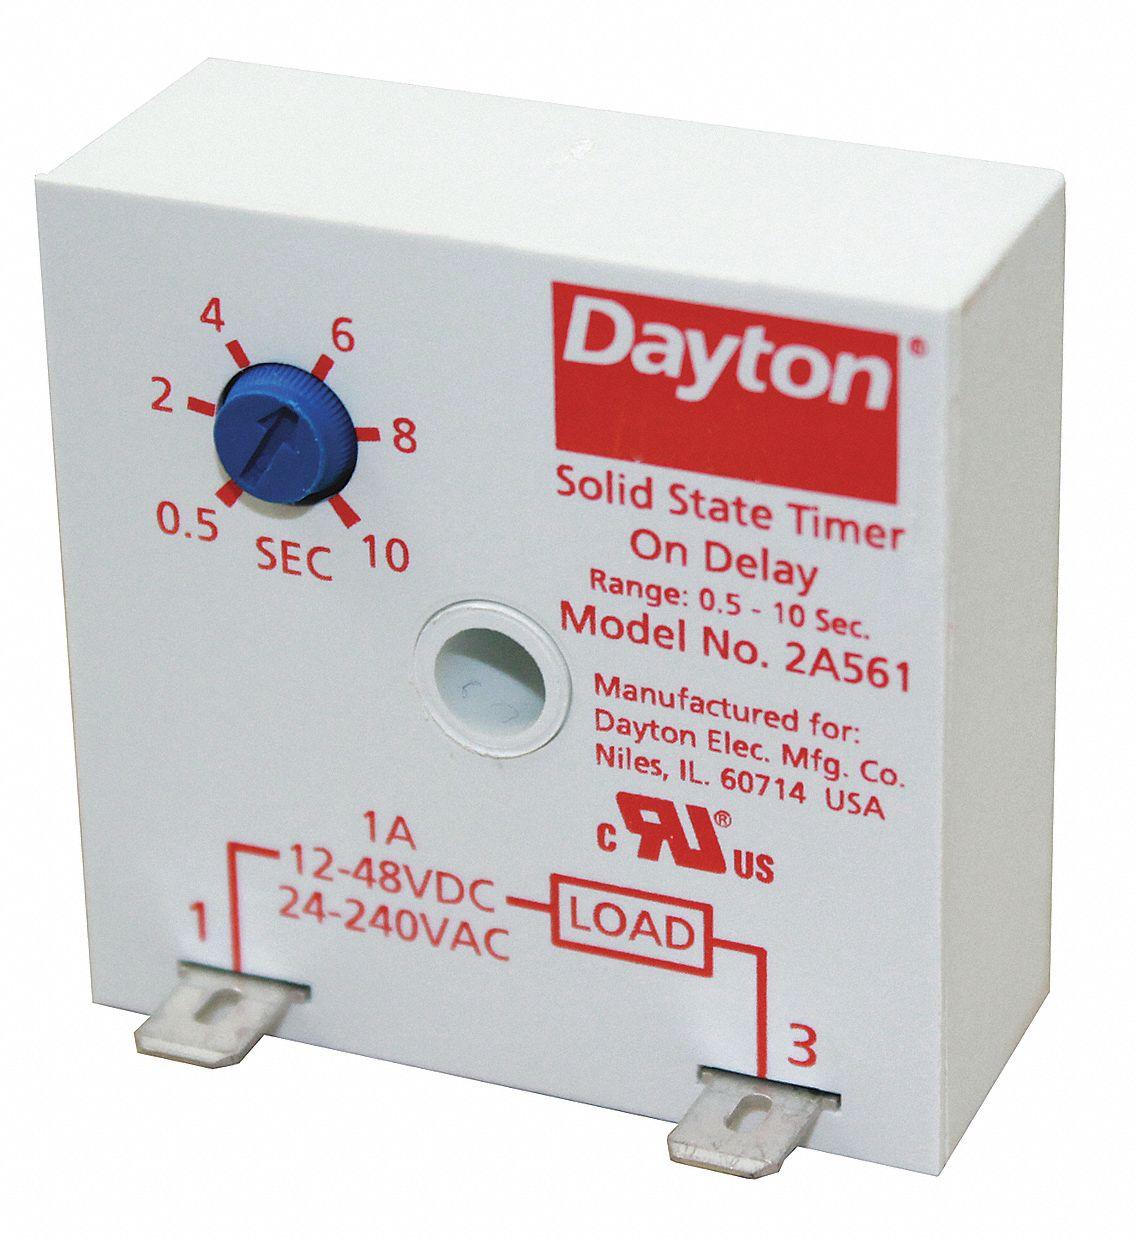 dayton timer relay wiring diagram 1997 jeep grand cherokee laredo contact us usa